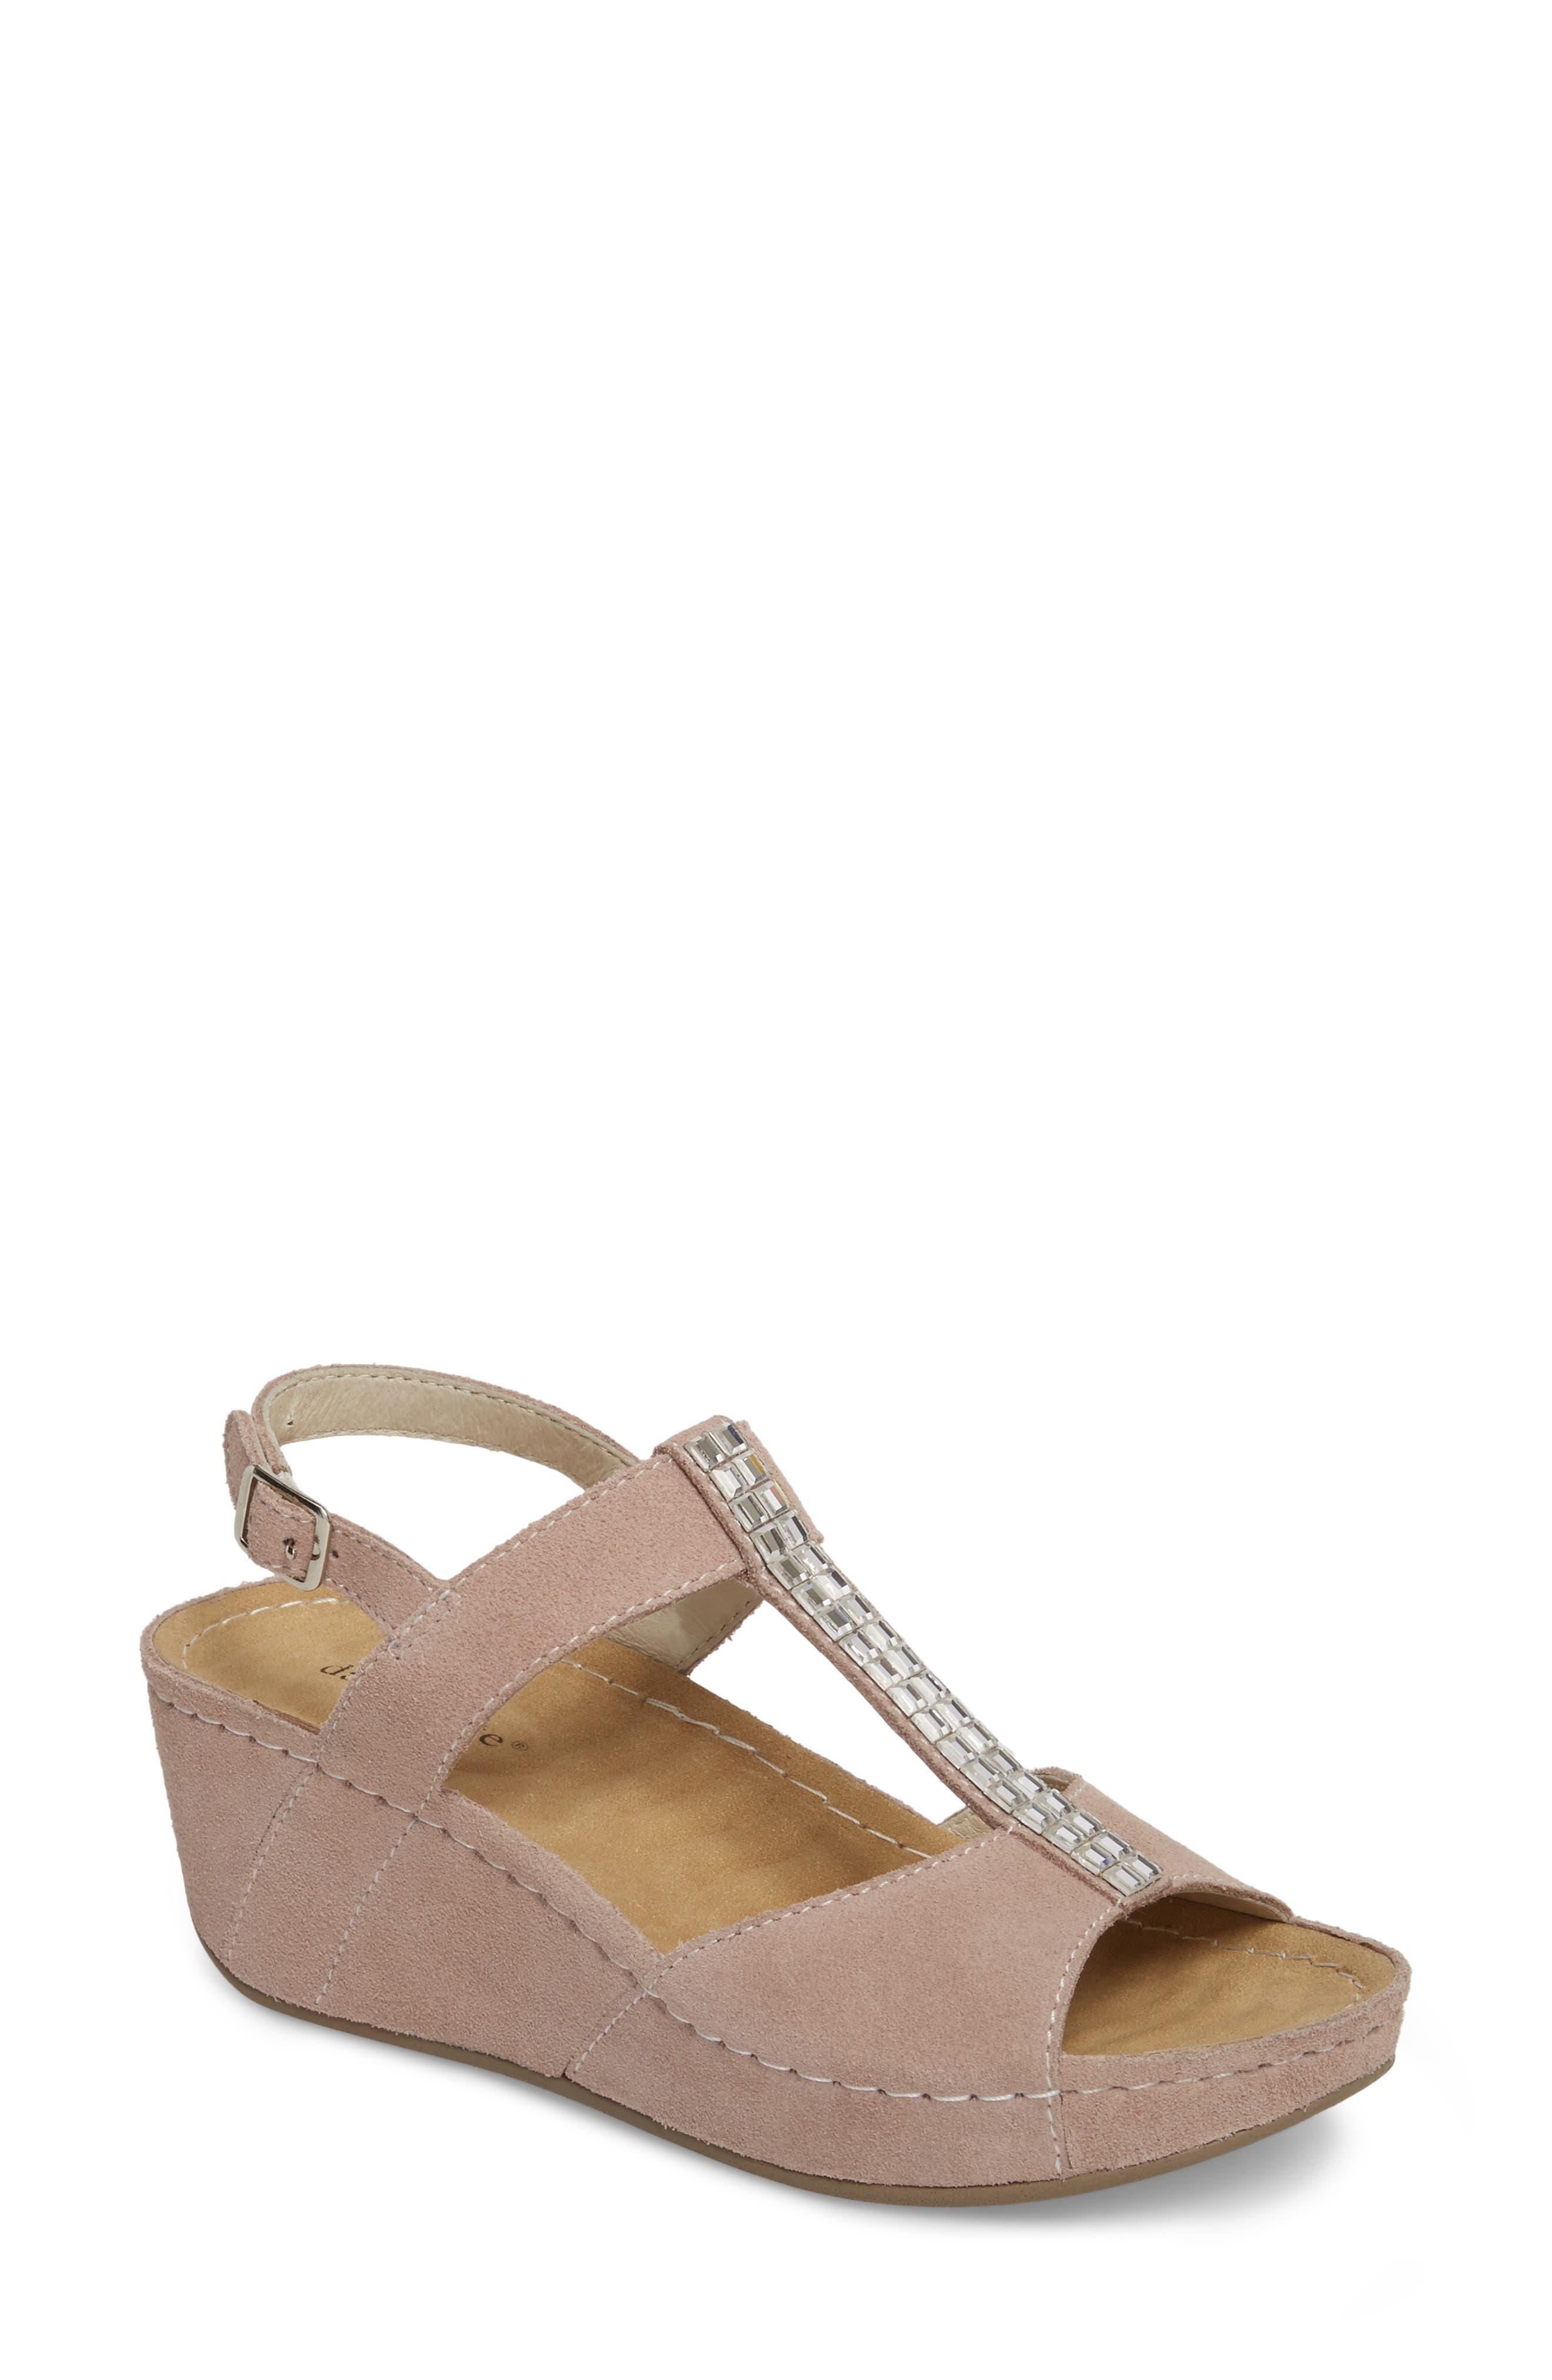 David Tate Bubbly Embellished T-Strap Wedge Sandal (Women)